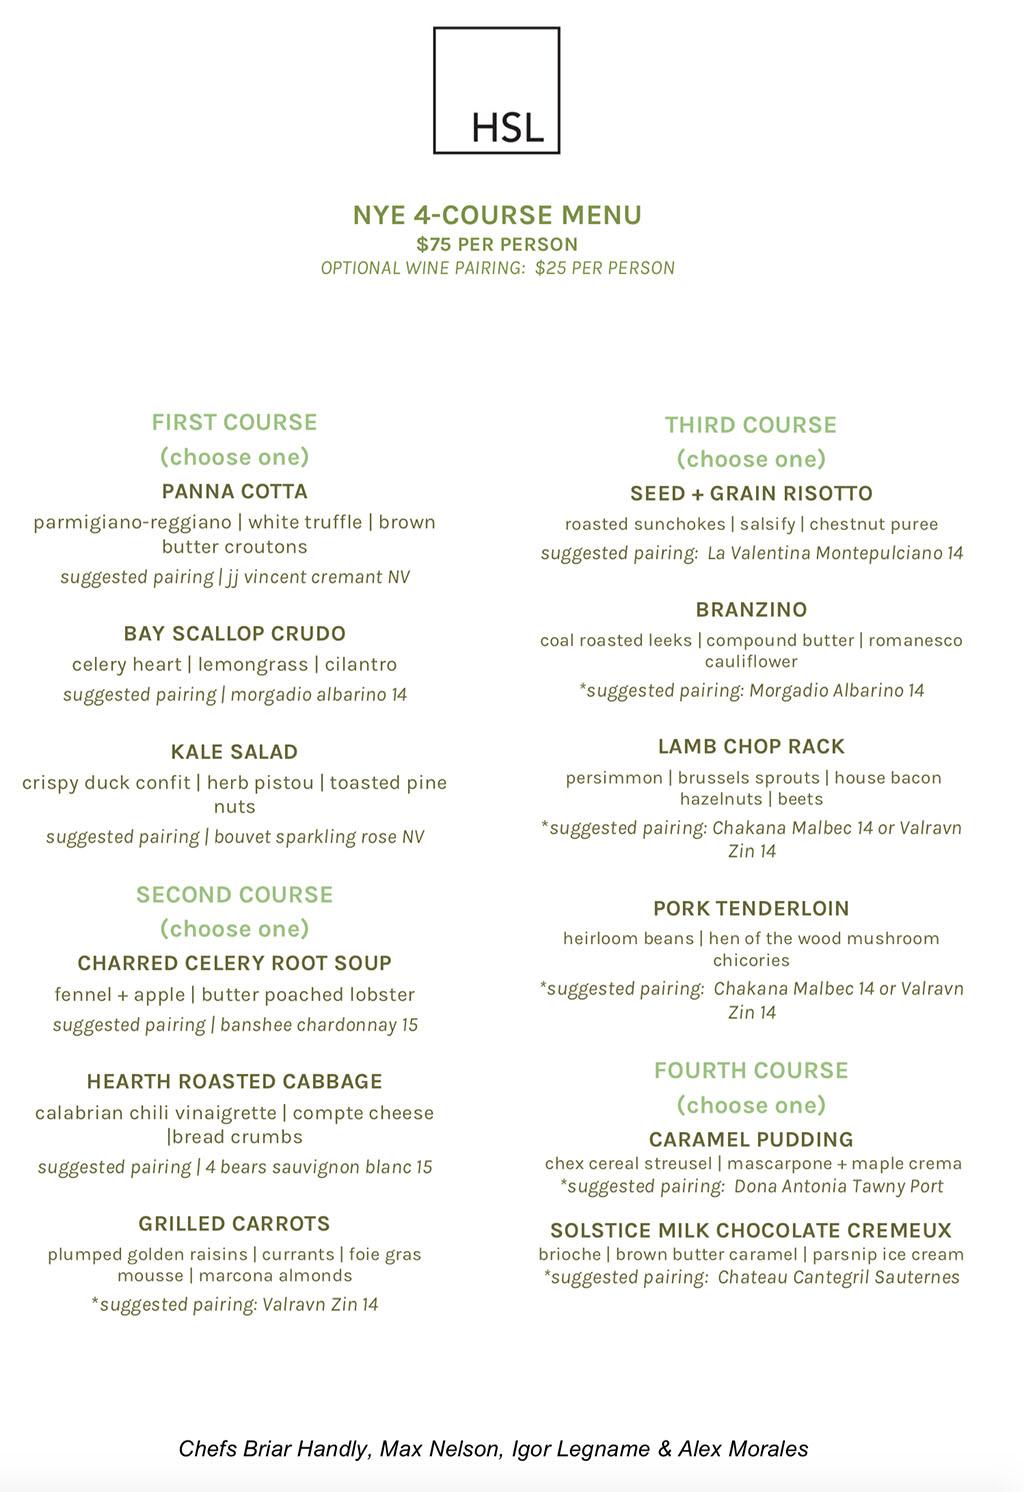 HSL NYE 2017 menu